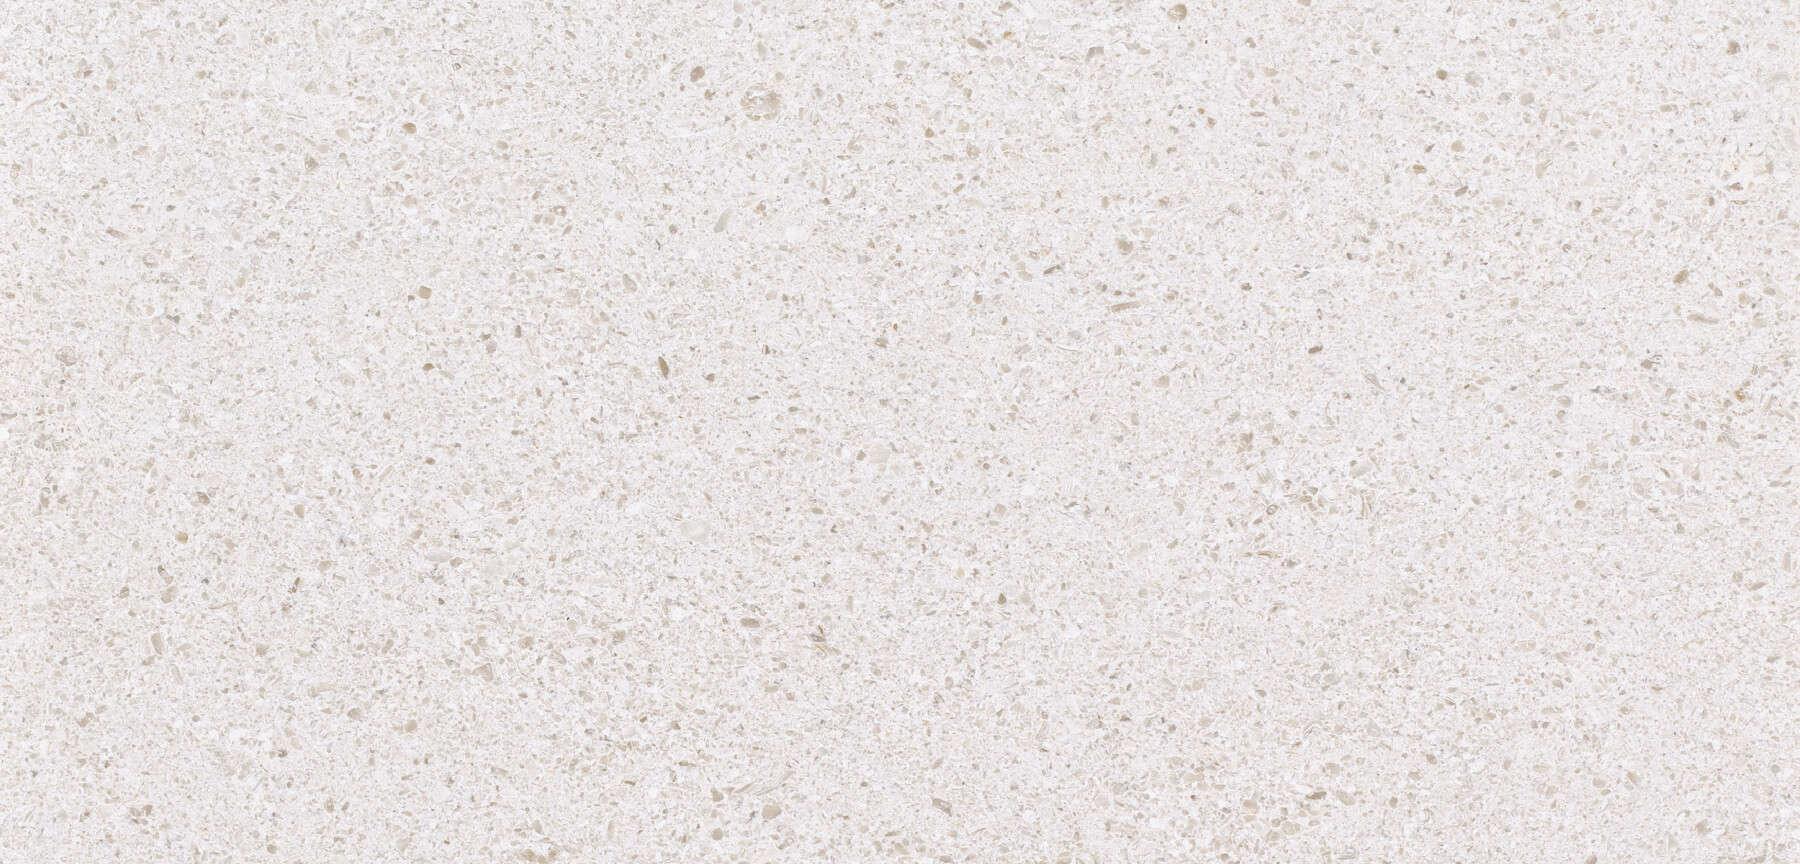 Caliza-blanca-turca-limra-antalya.jpg